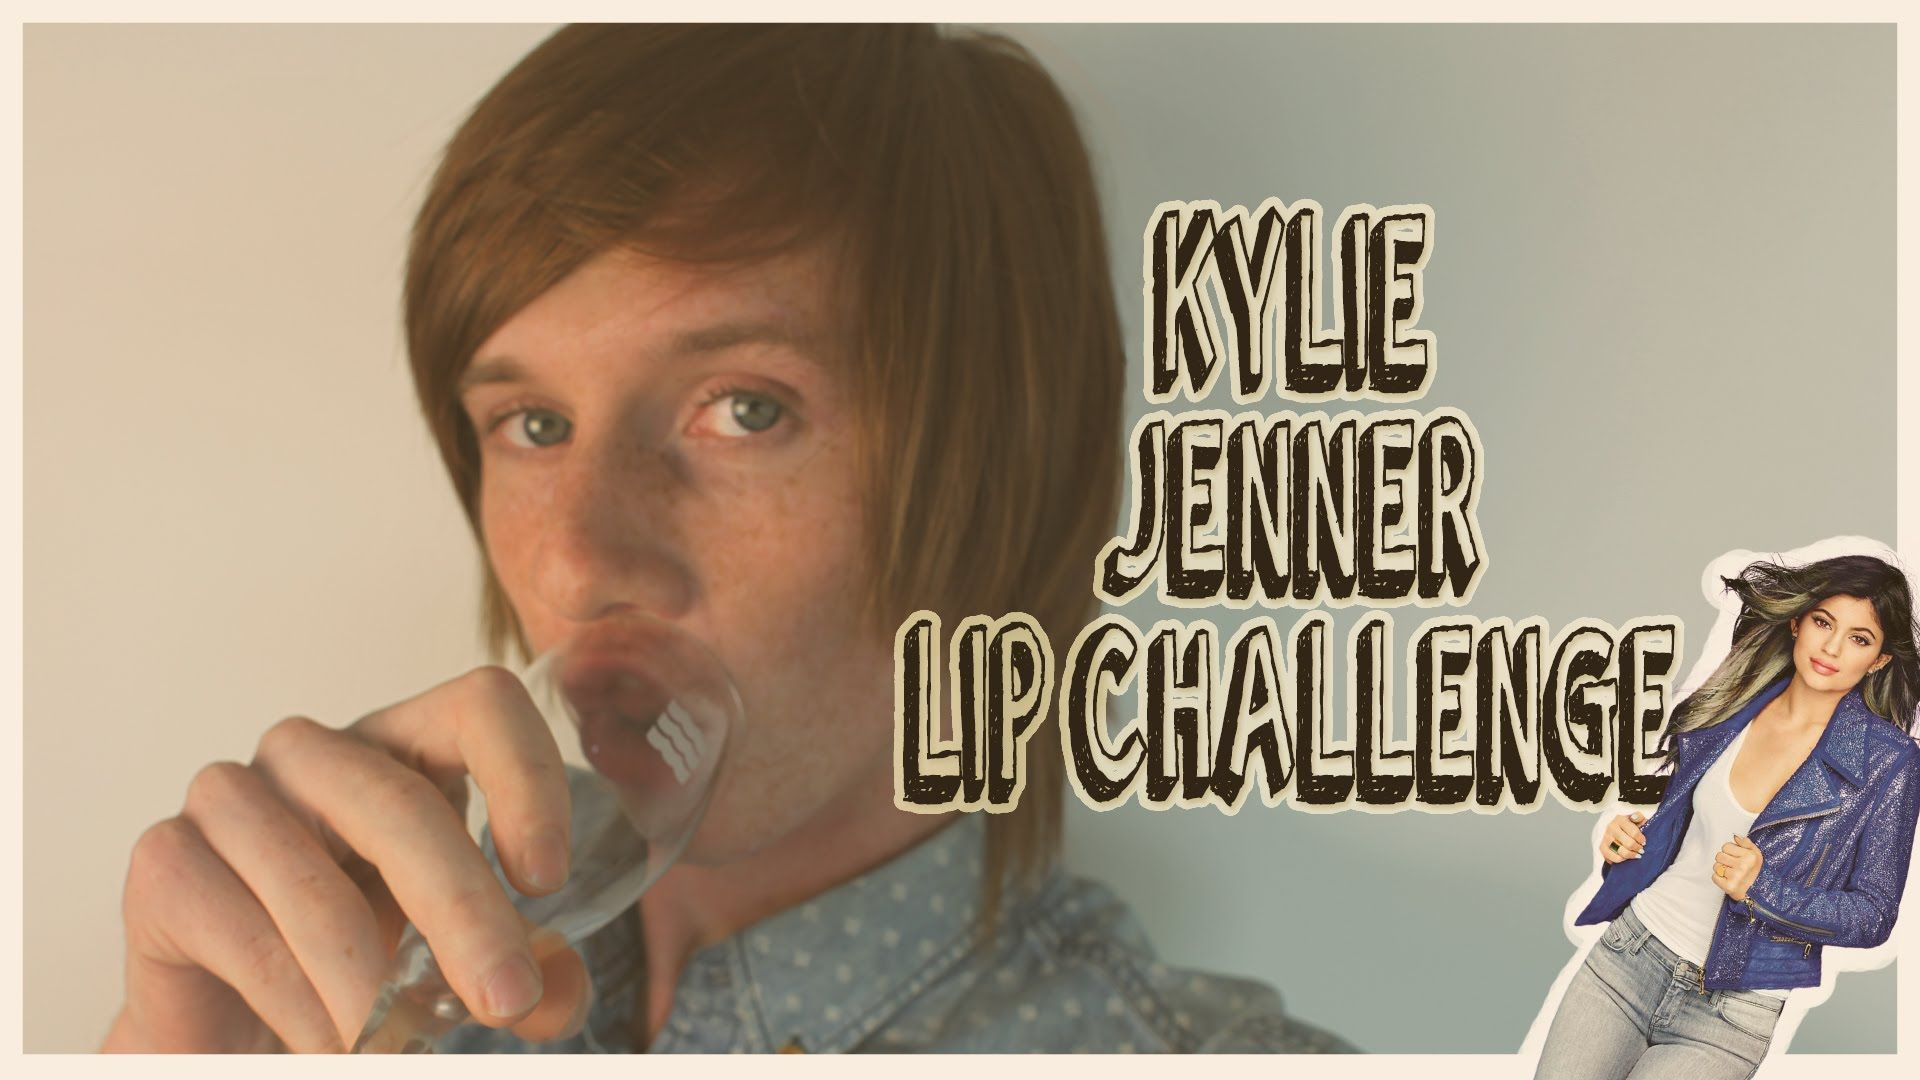 kylie jenner lip challenge instructions